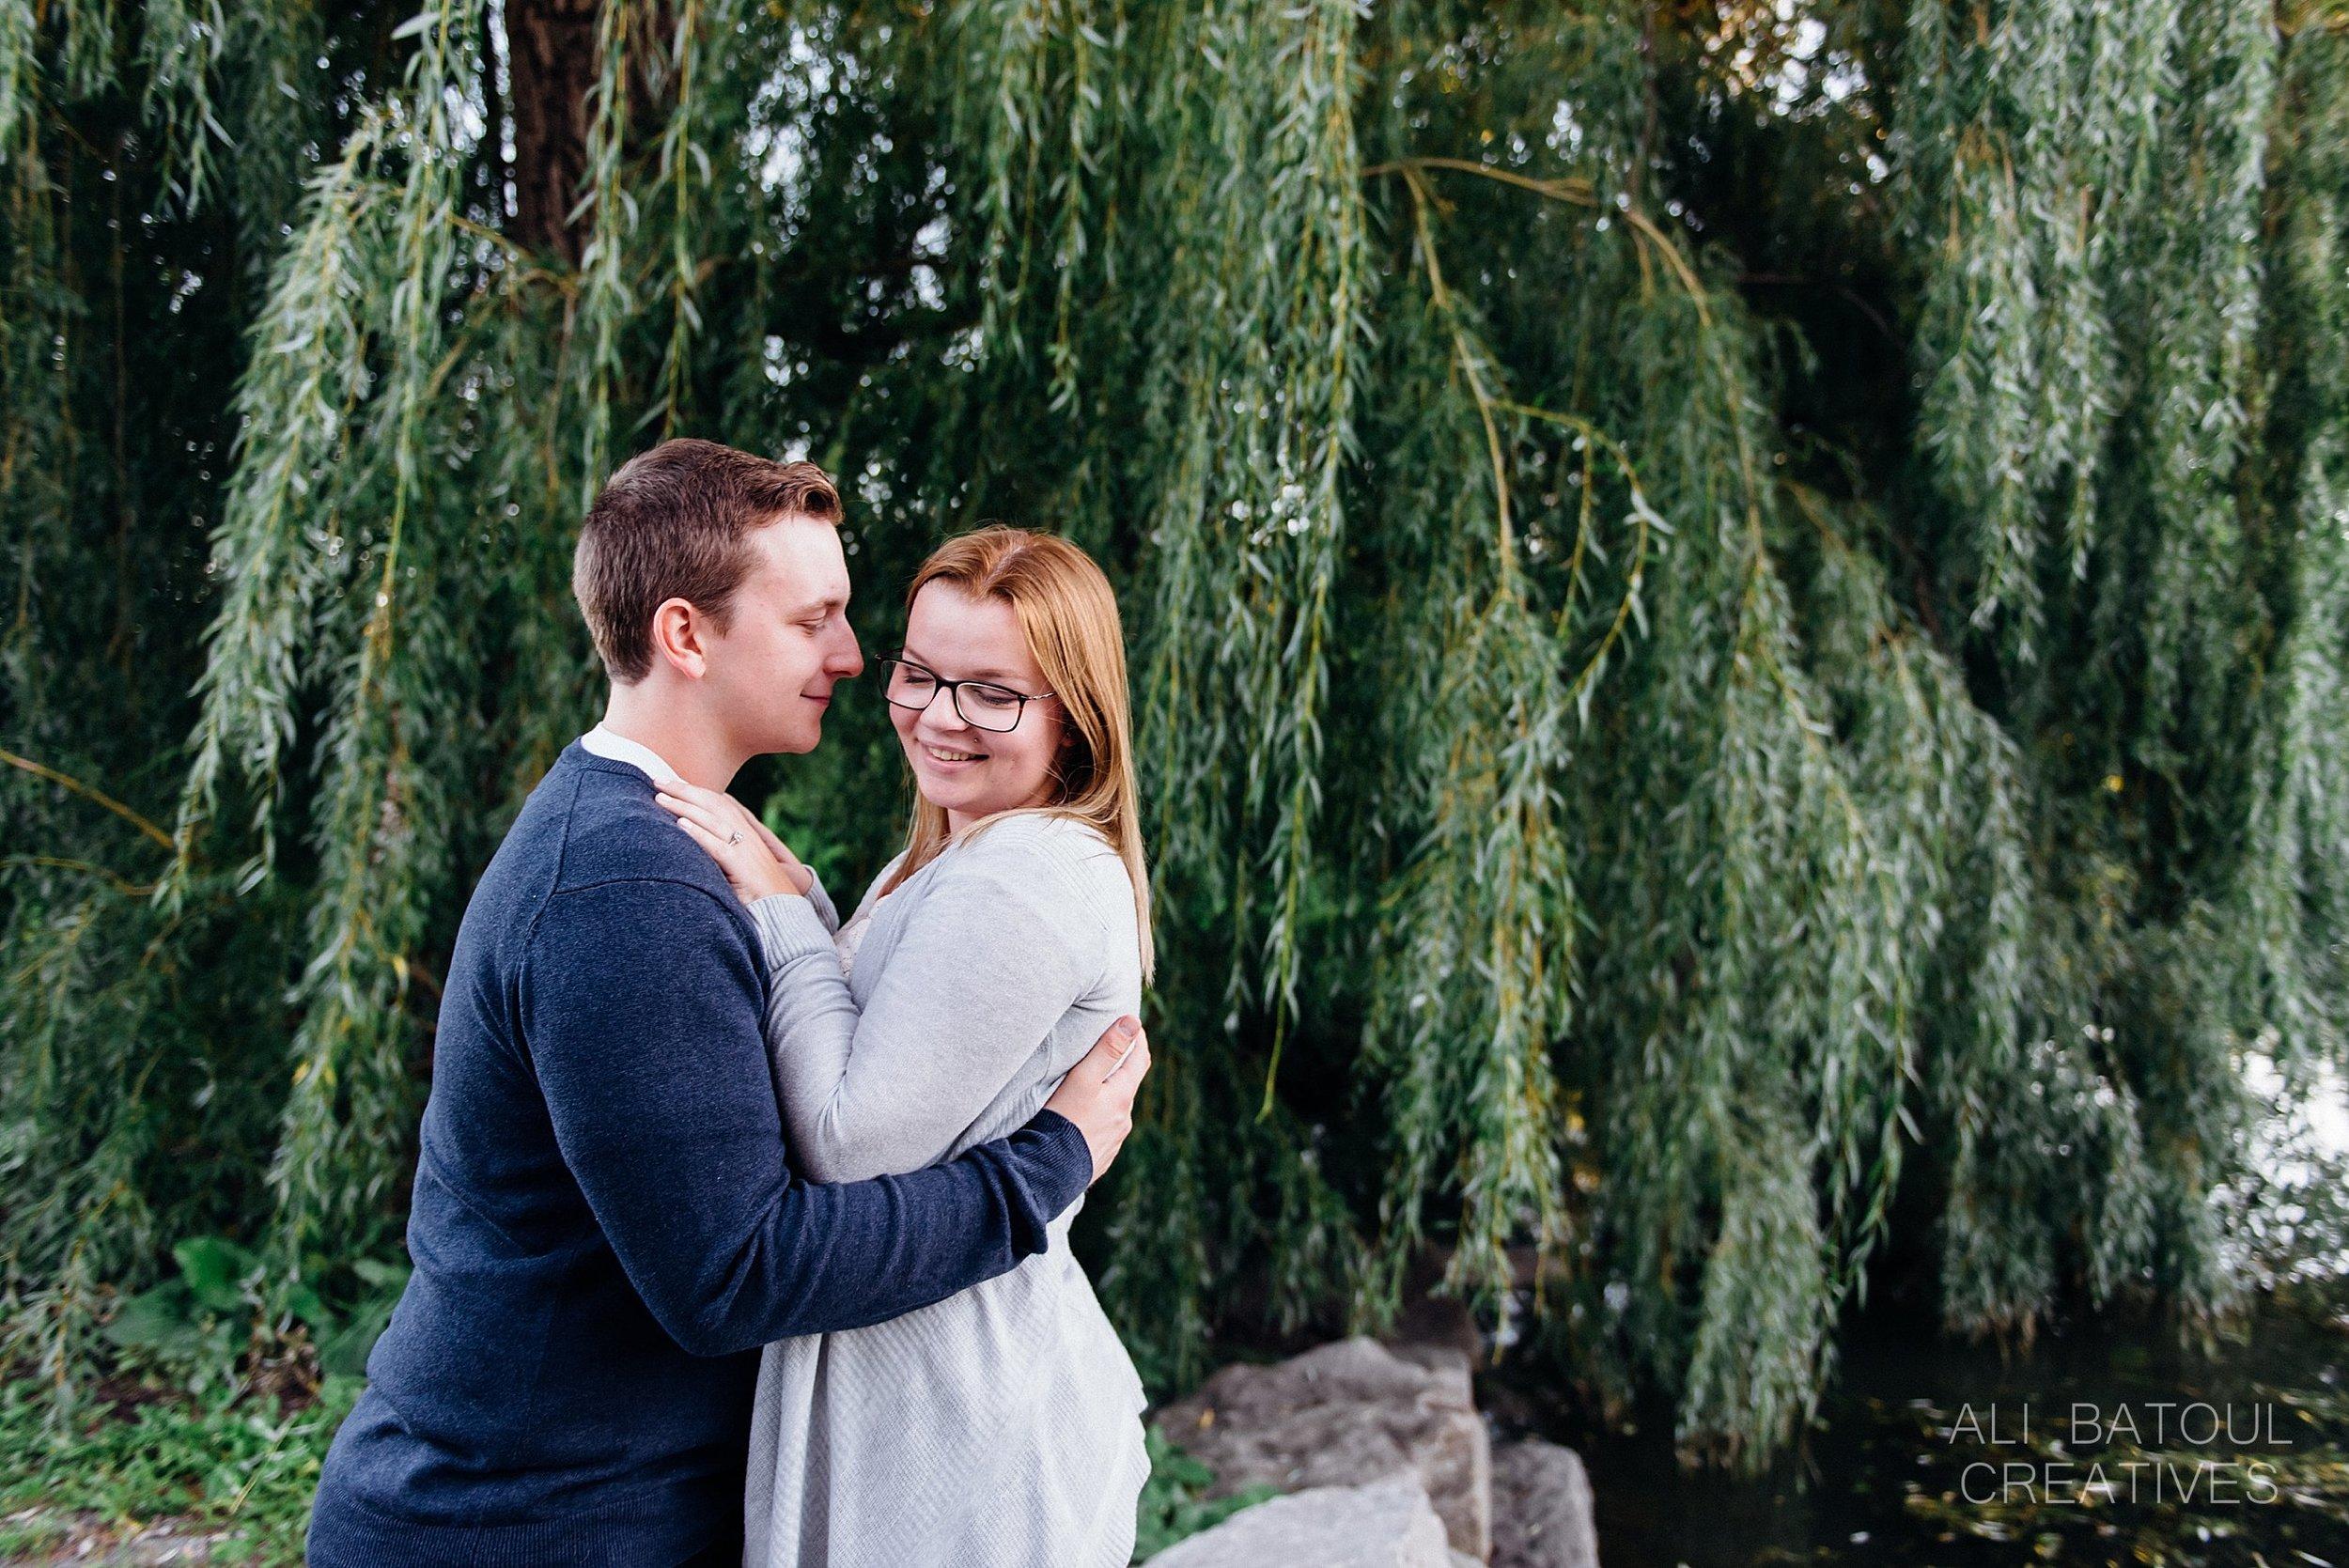 Natasha + Rich Ottawa Arboretum Engagement Photos - Ali and Batoul Fine Art Wedding Photography_0040.jpg